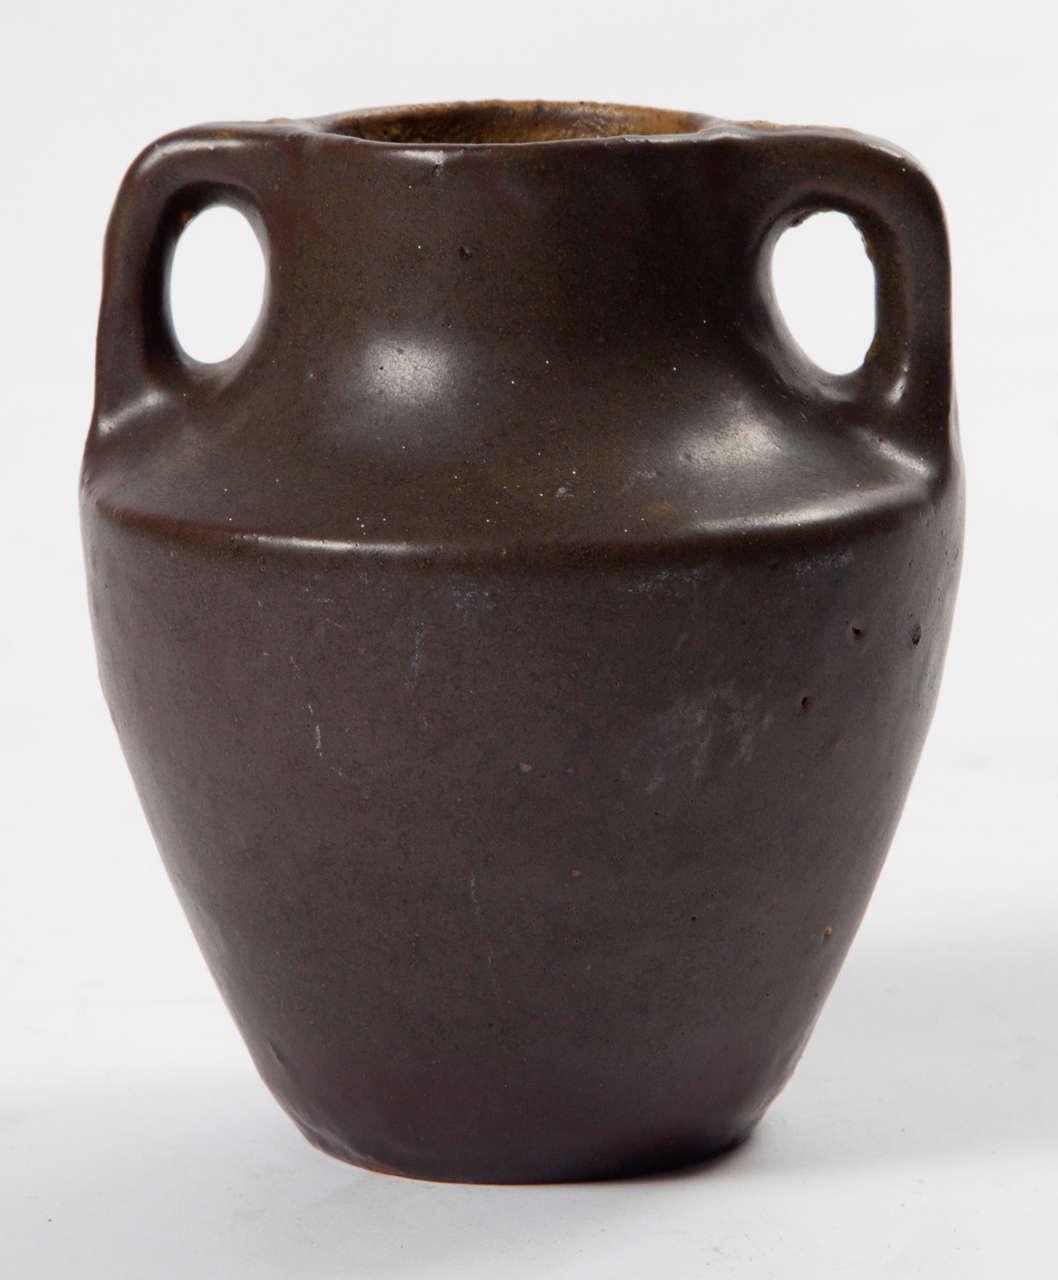 Danish Pottery Vase 2